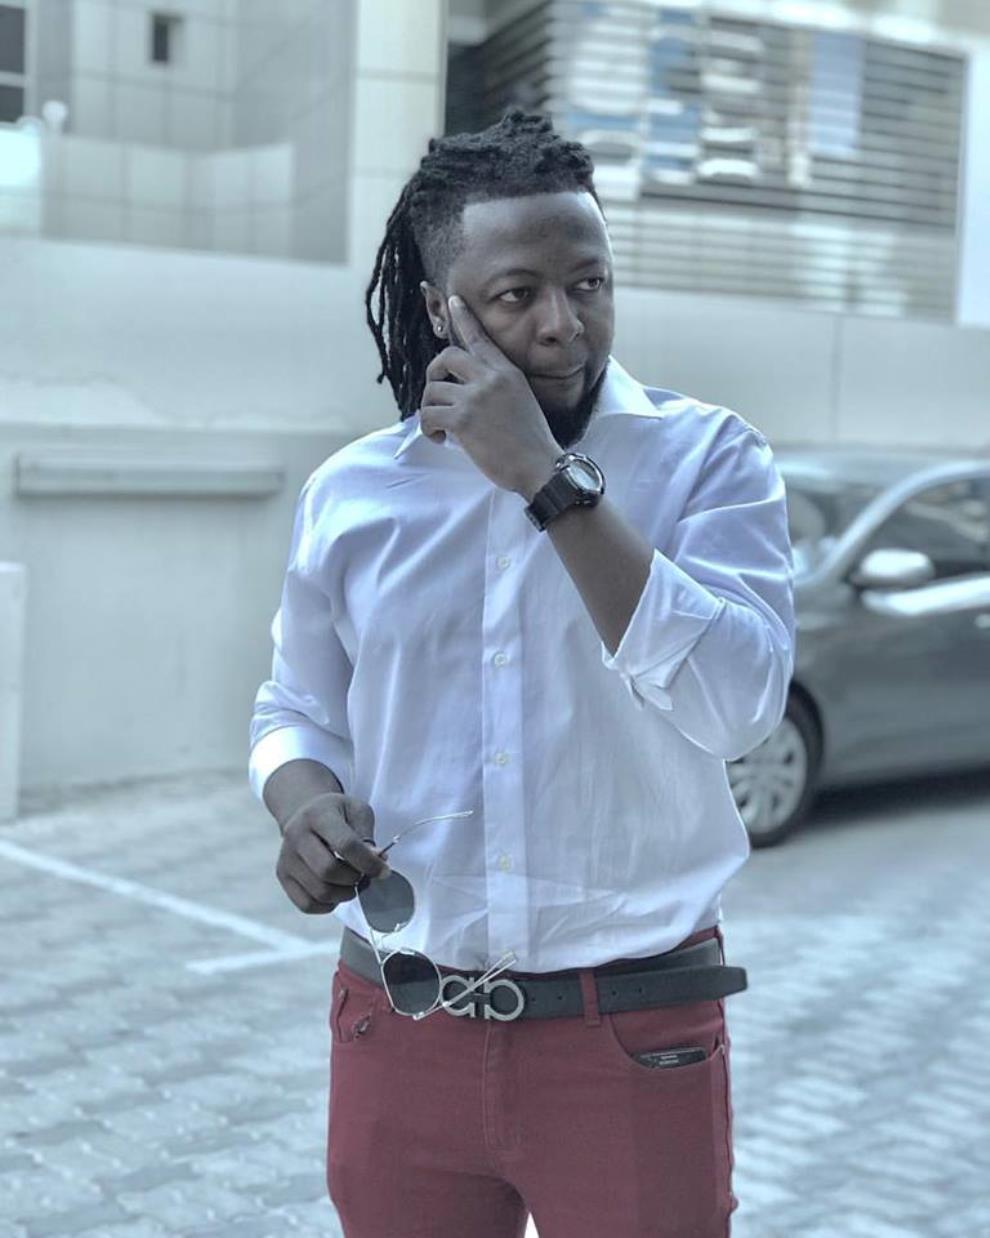 Guru To Critics: What's Strange About Me Shooting Music Videos Amounting $200, 000in Dubai?